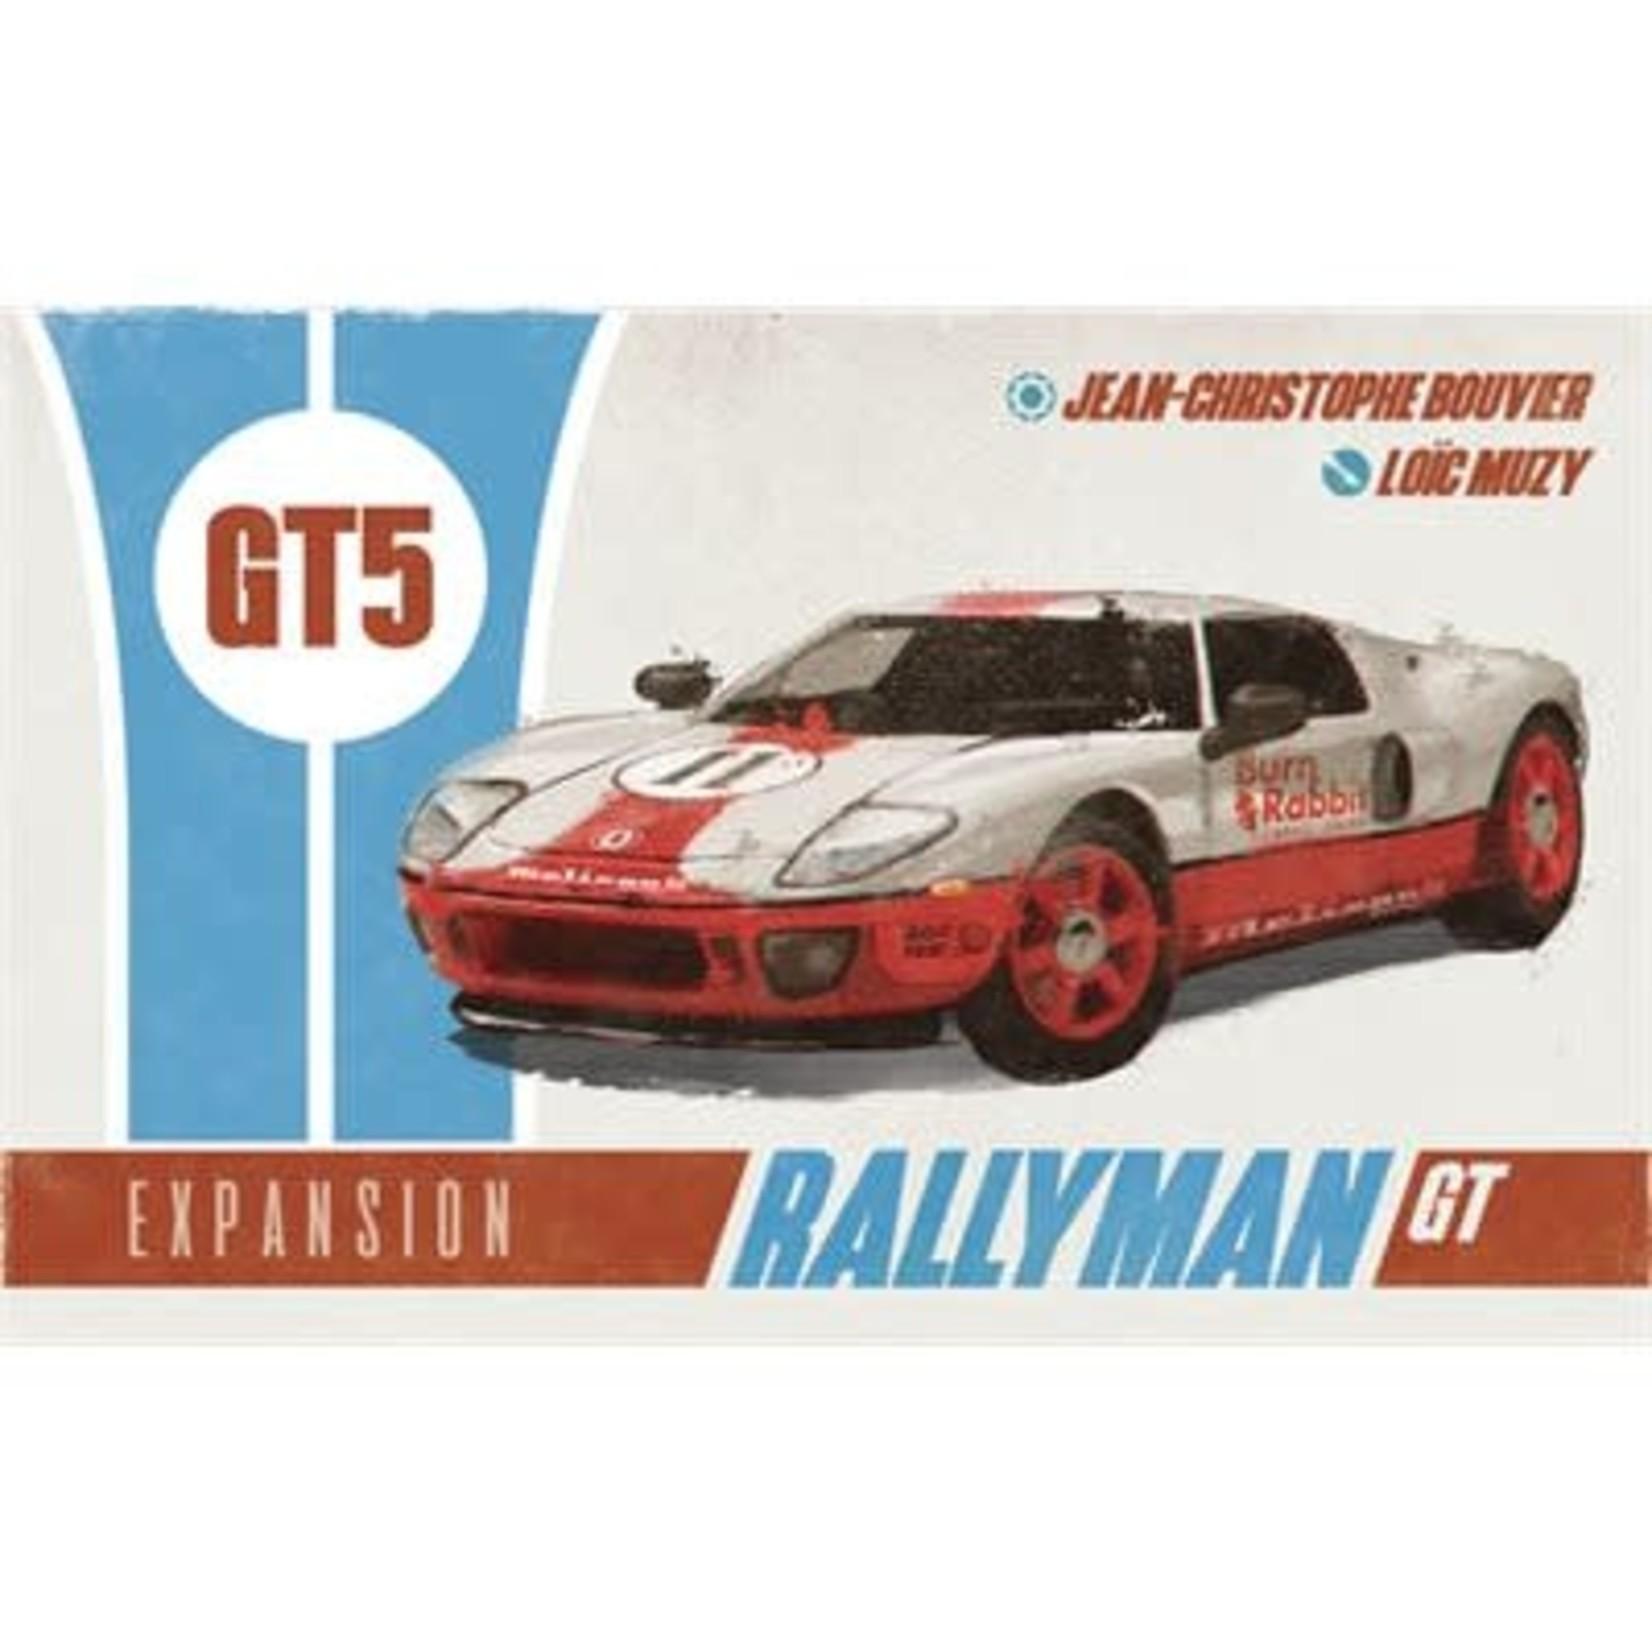 Rallyman: Extension GT5 (Fr)